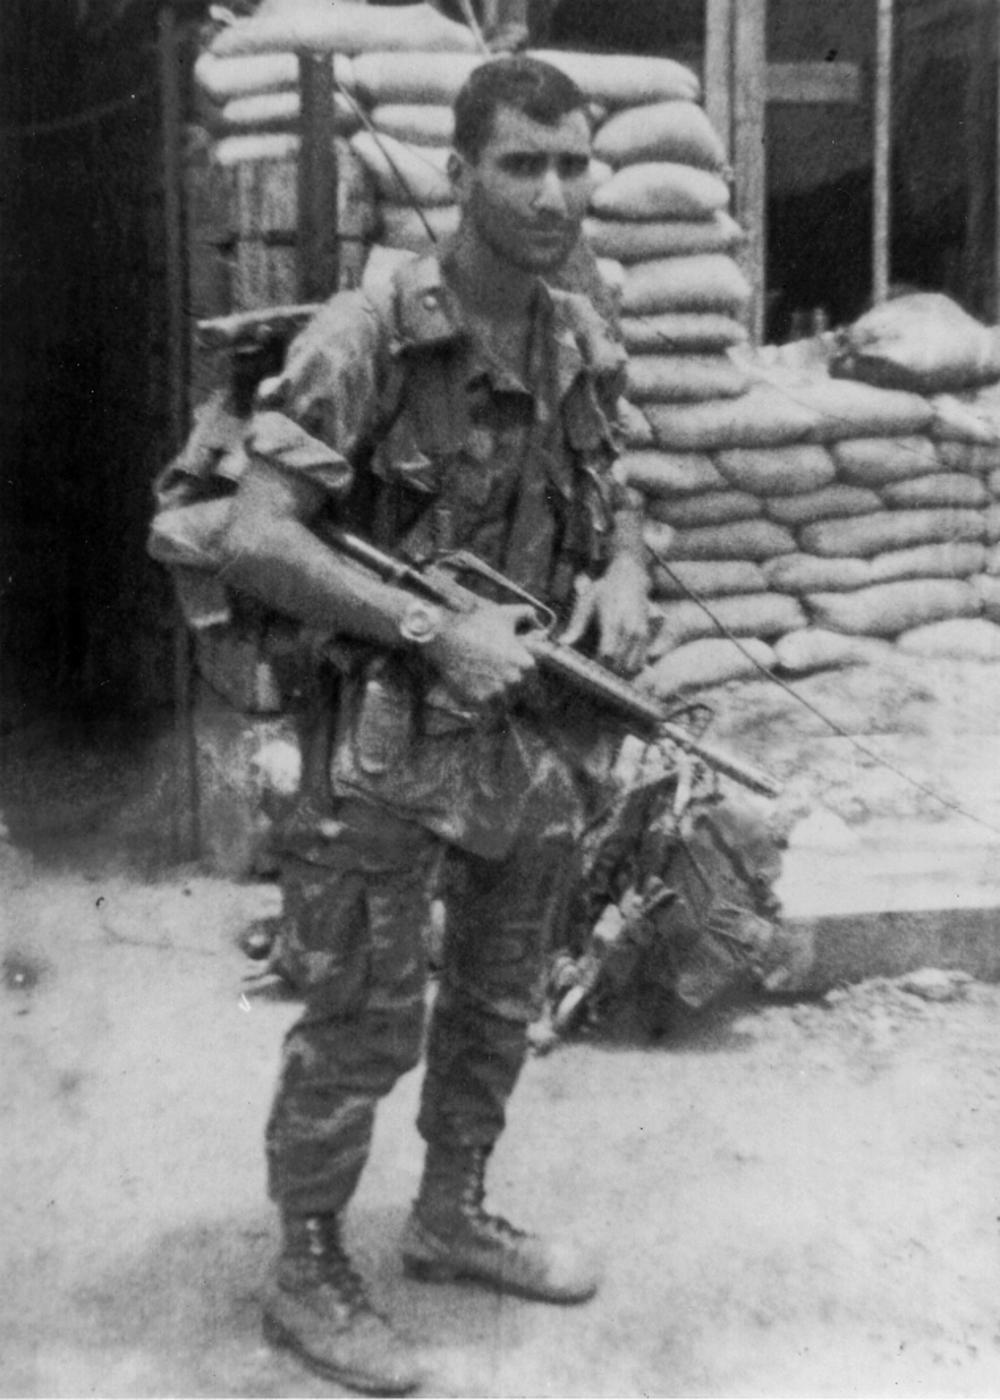 Sgt. Robert Ankony, LZ Betty